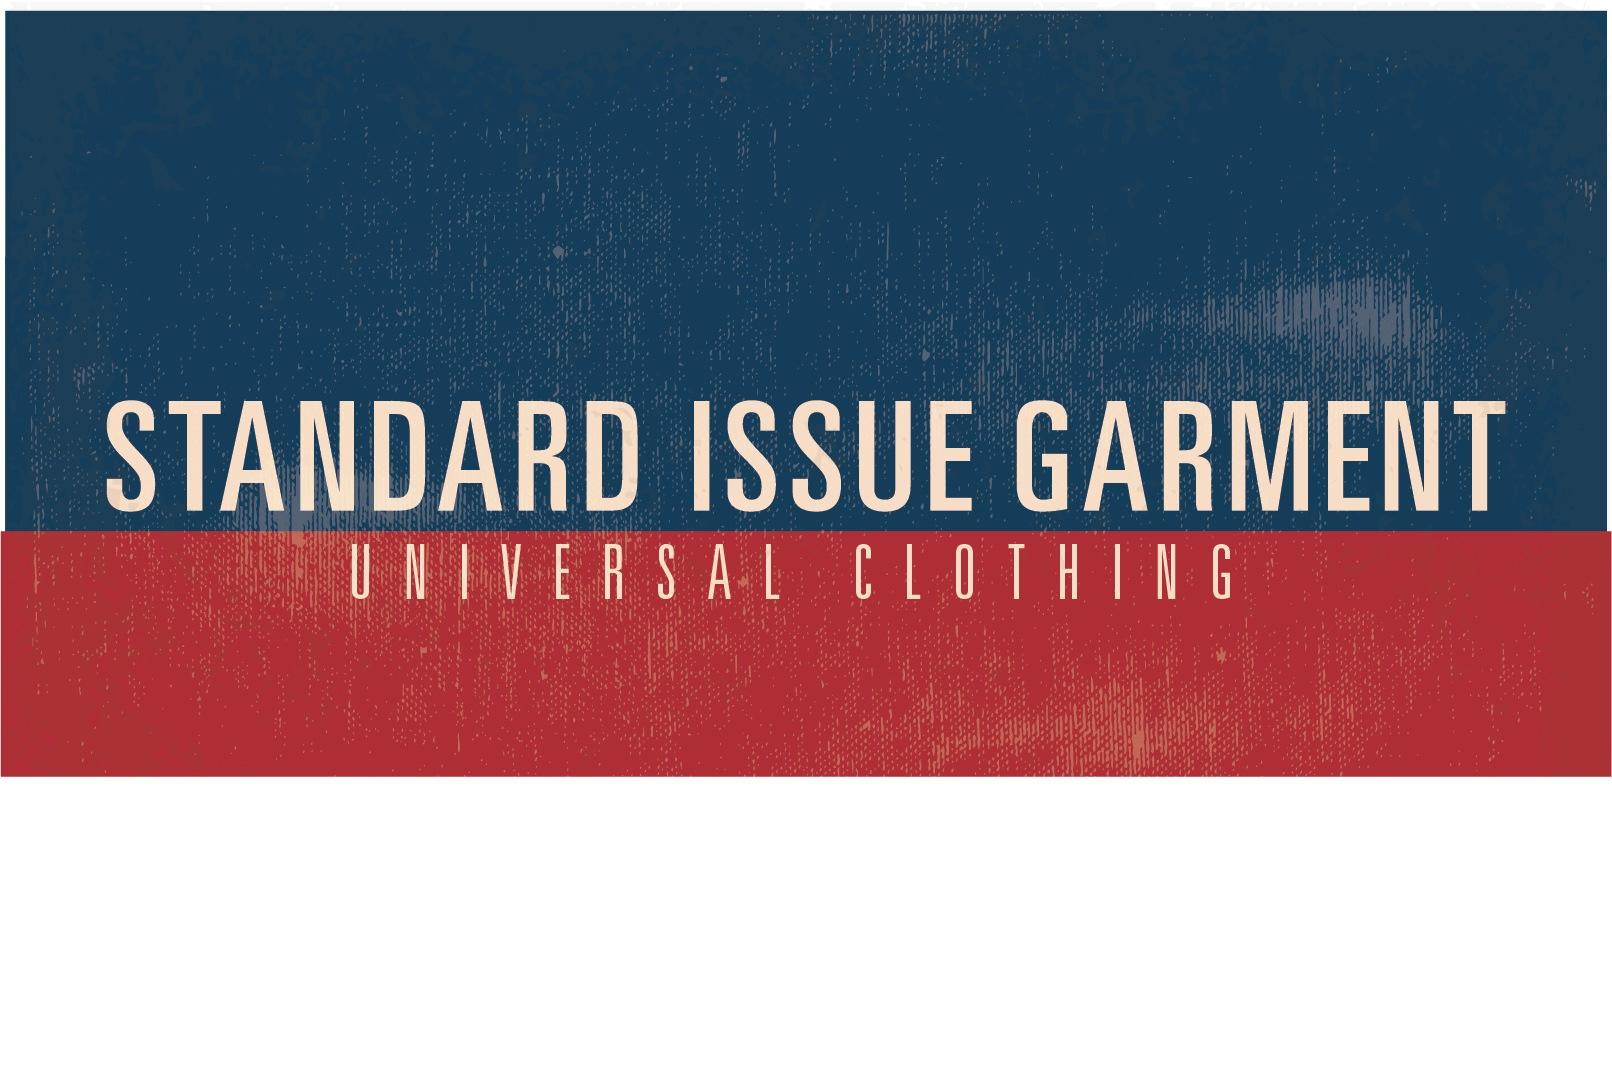 Standard Issue Garment Store